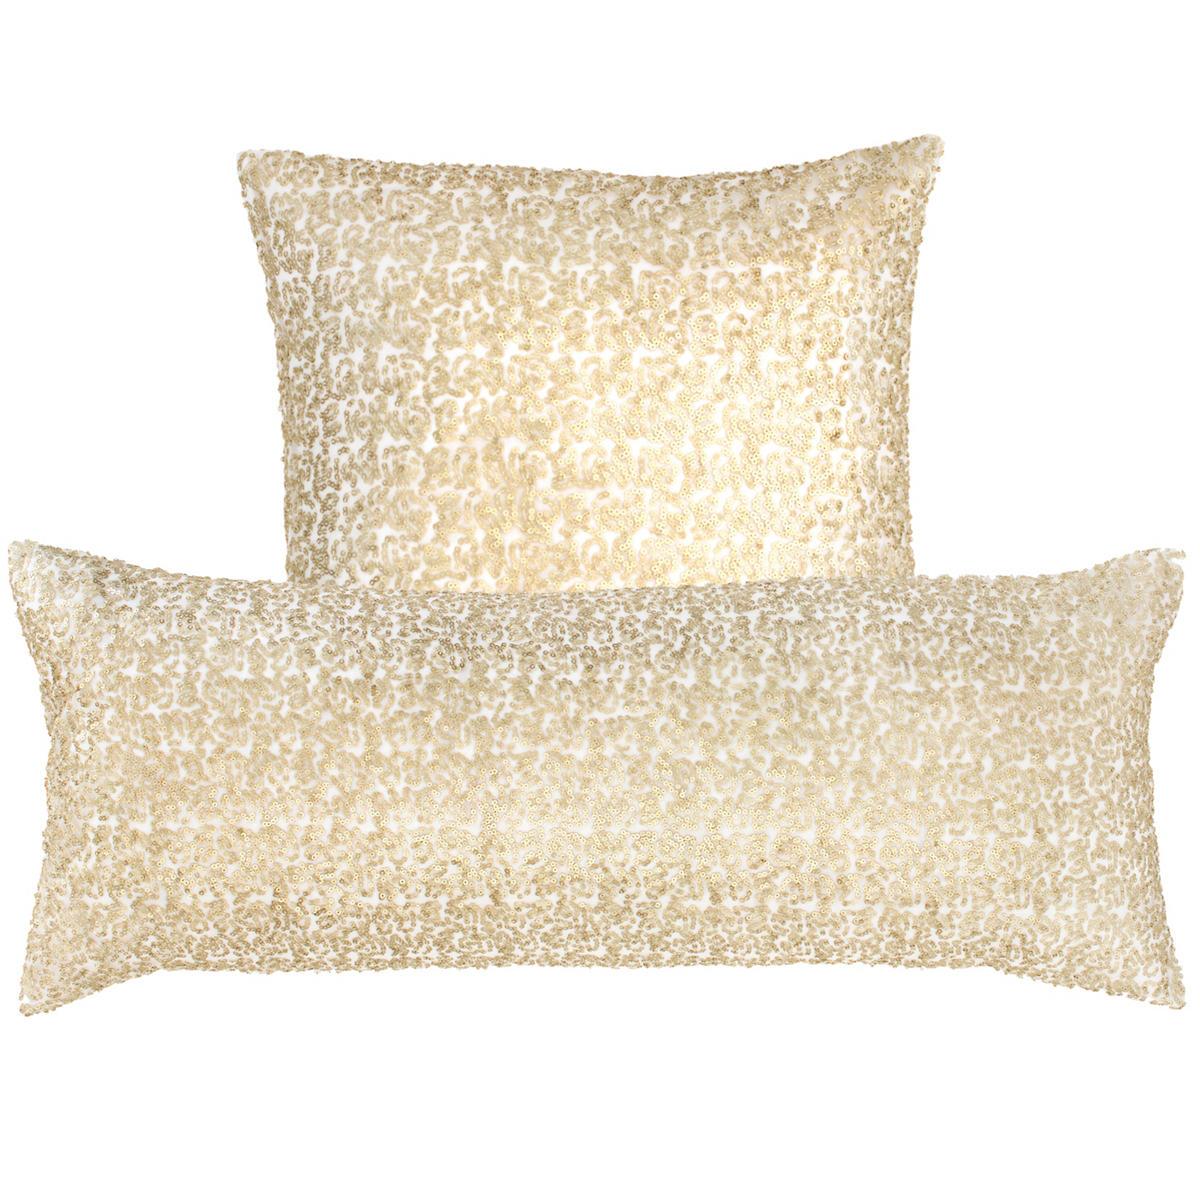 Glaze Sequin Ivory/Sand Decorative Pillow